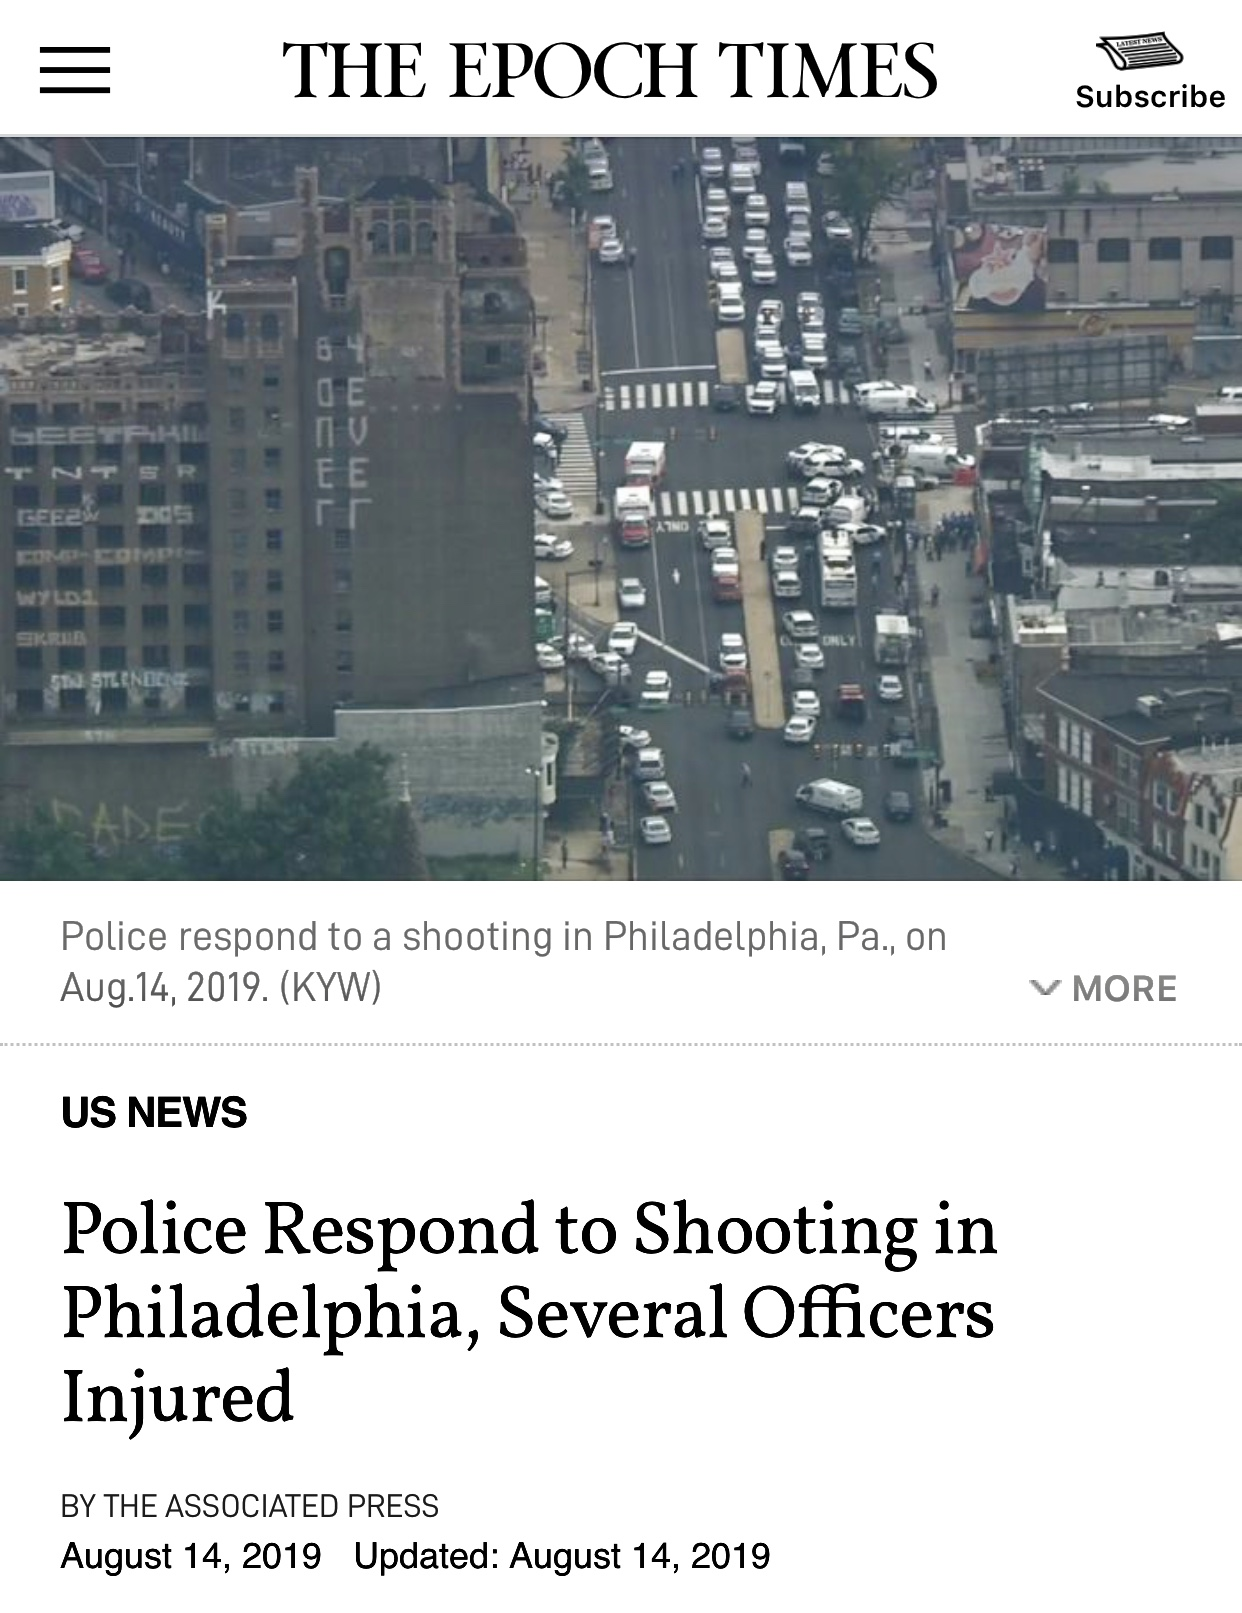 Breaking News: Shooting in Philadelphia, Looks Like An Ambush